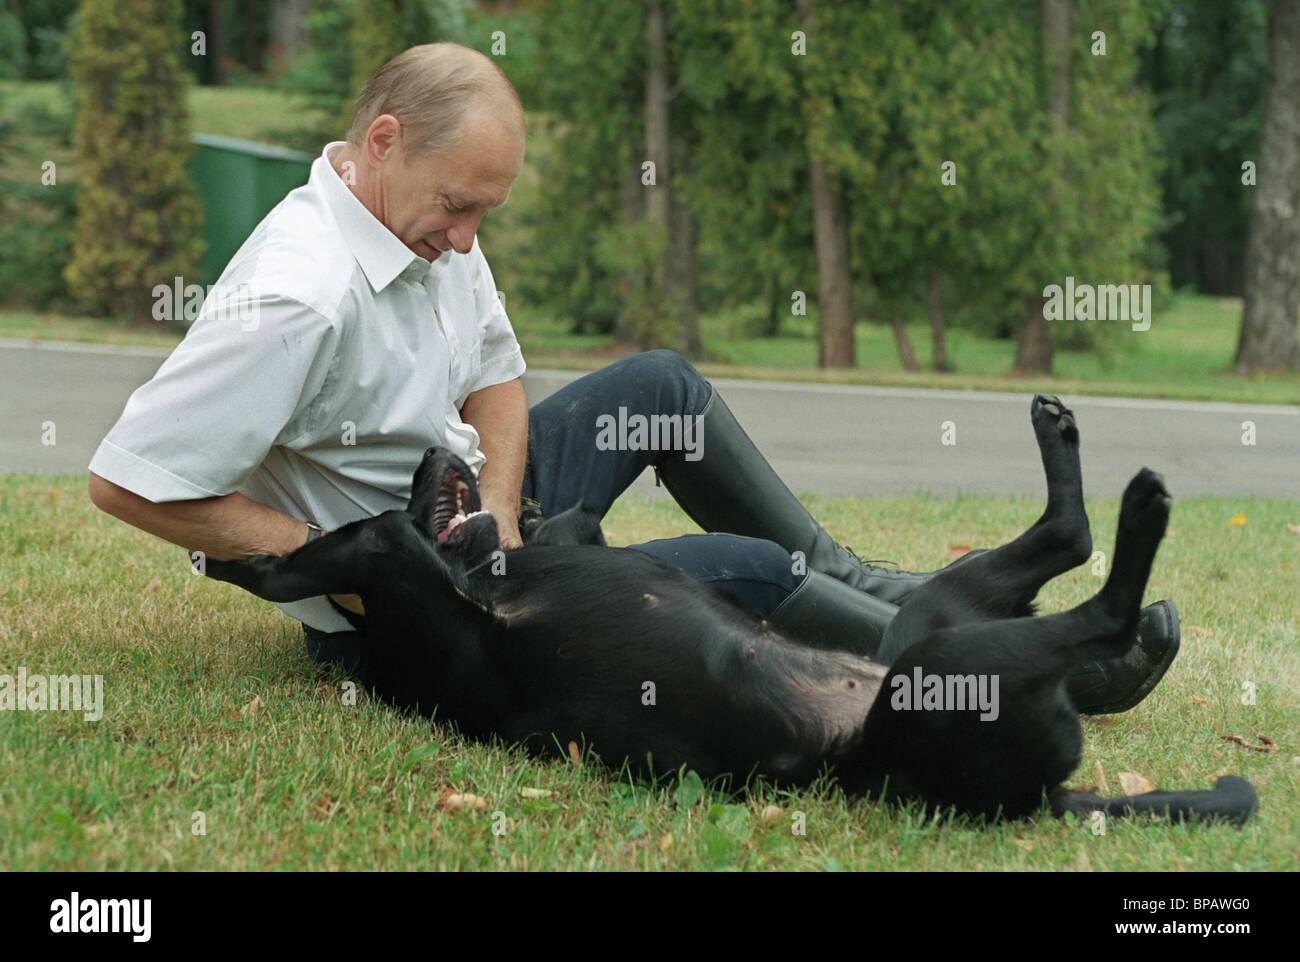 Russian President Vladimir Putin at his countryside residence Novo-Ogaryovo - Stock Image